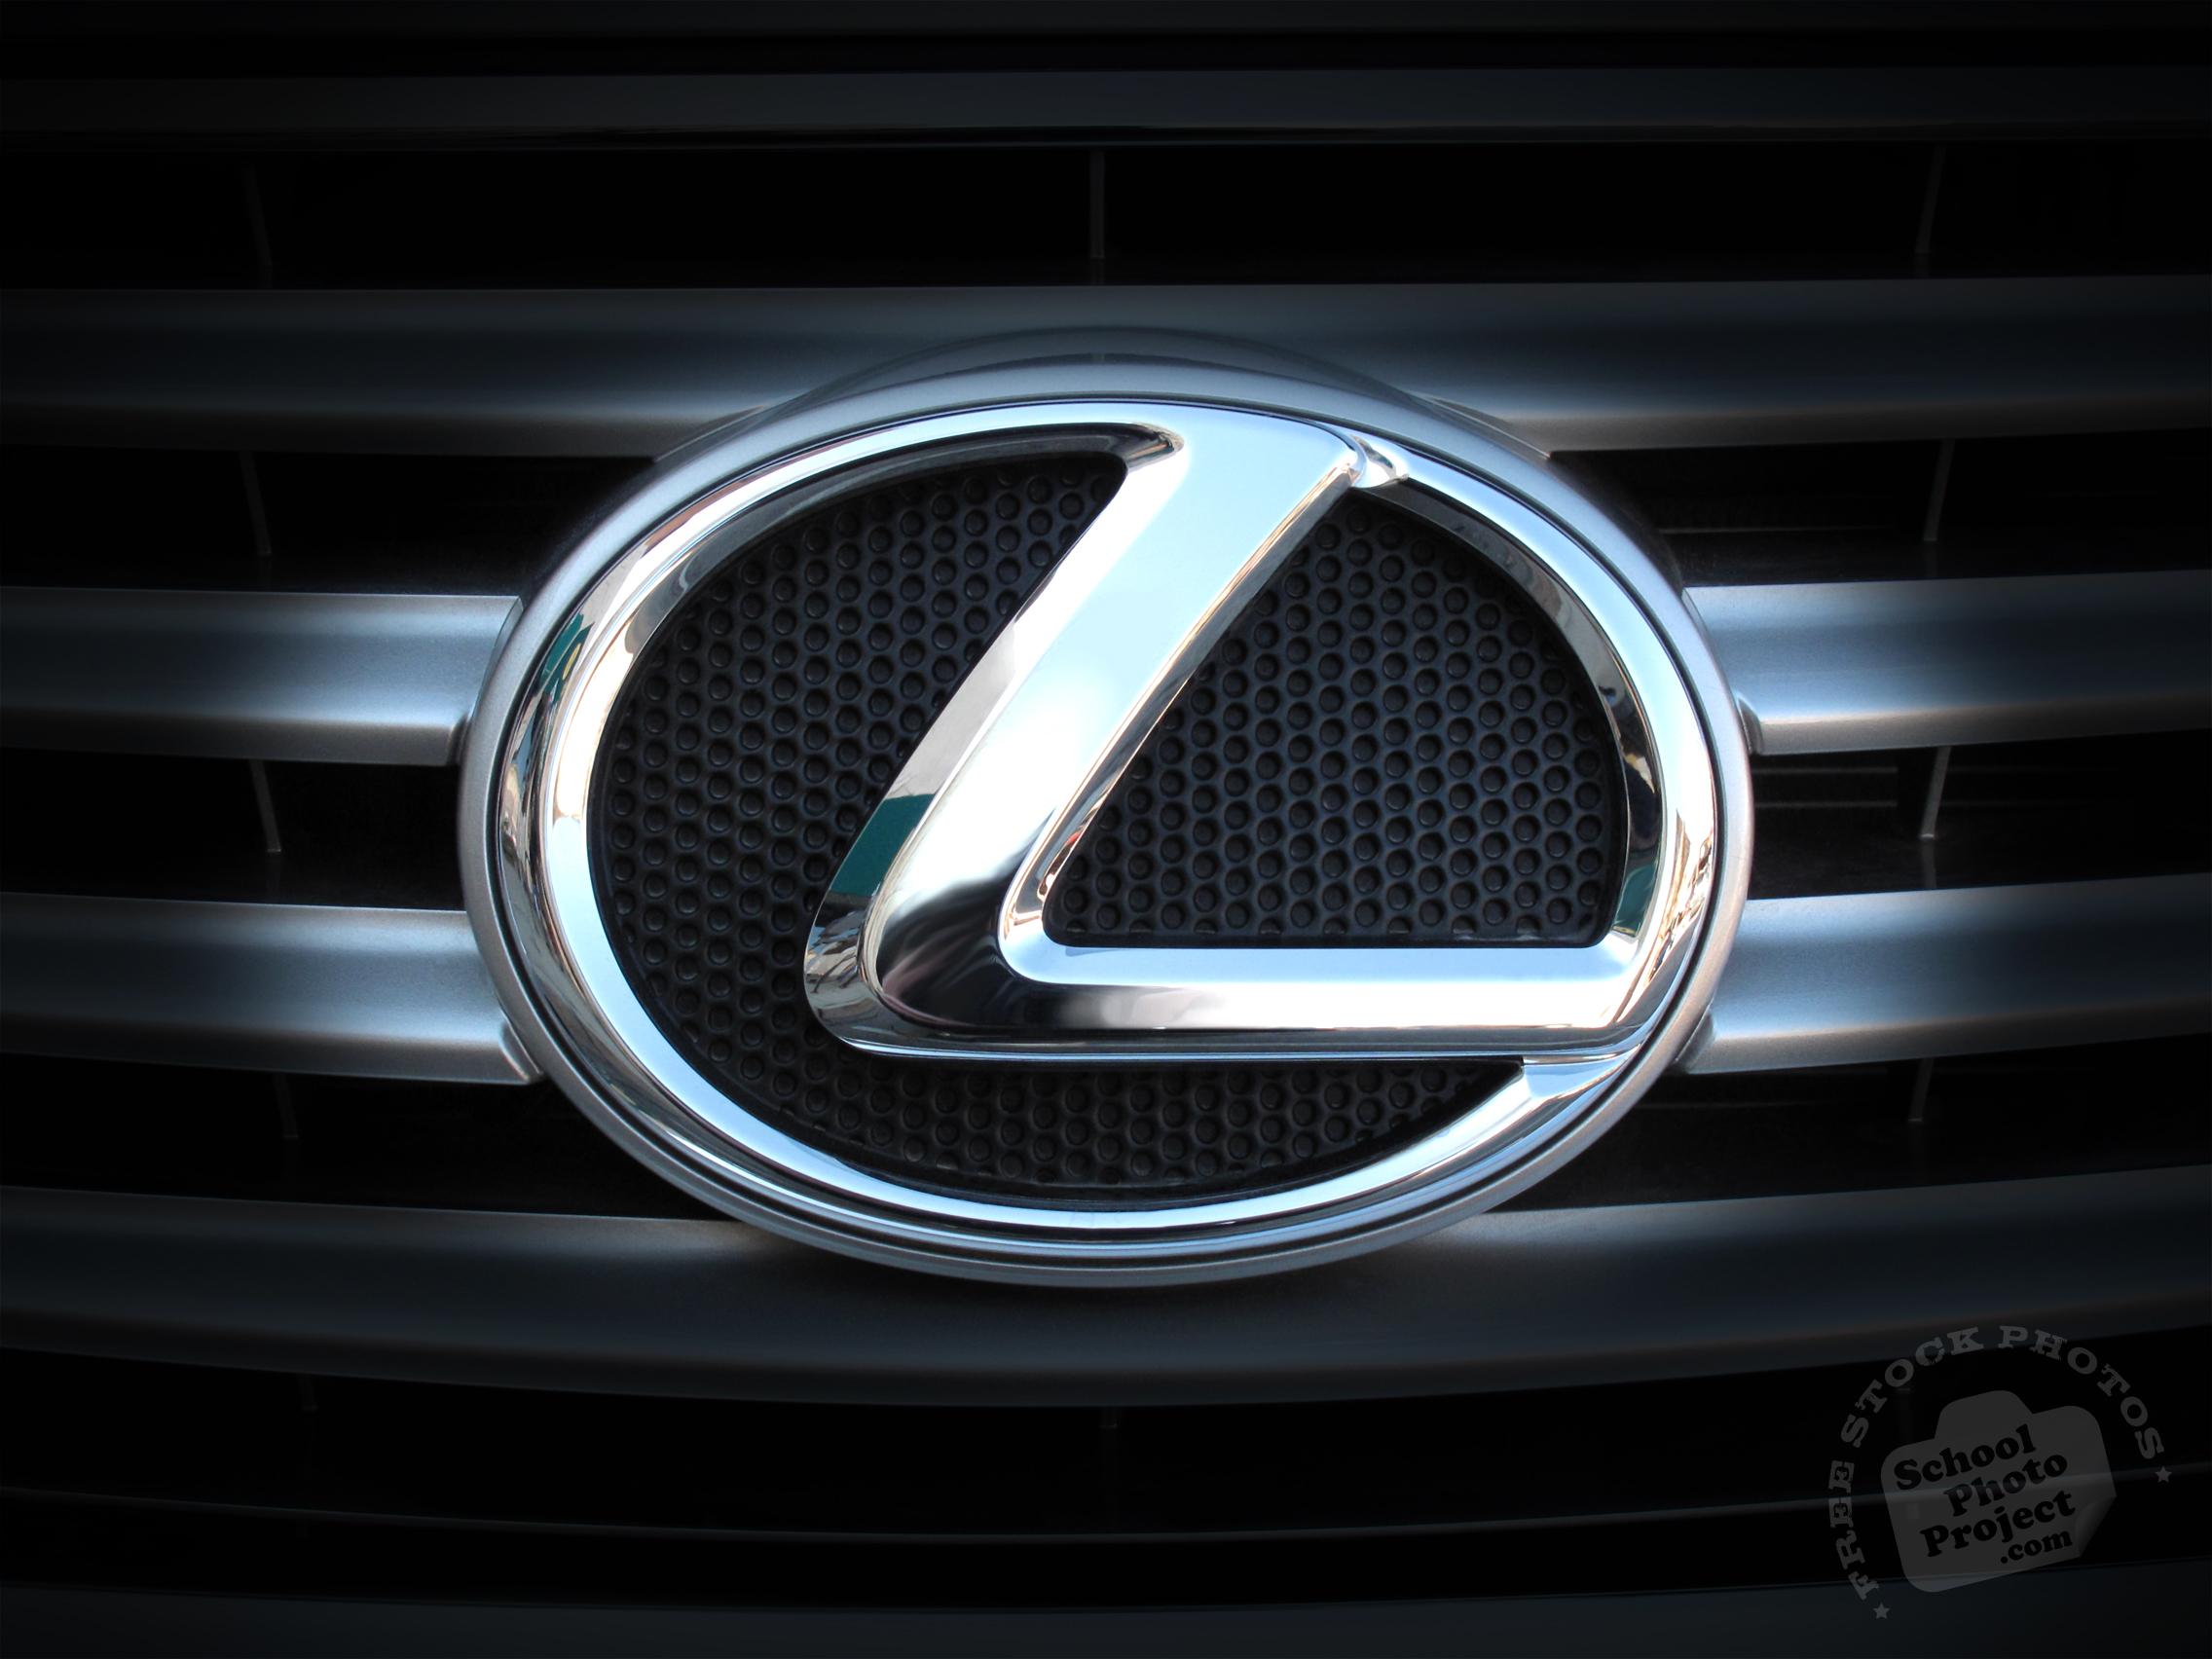 Oooo Car Wallpaper Lexus Logo Free Stock Photo Image Picture Lexus Logo